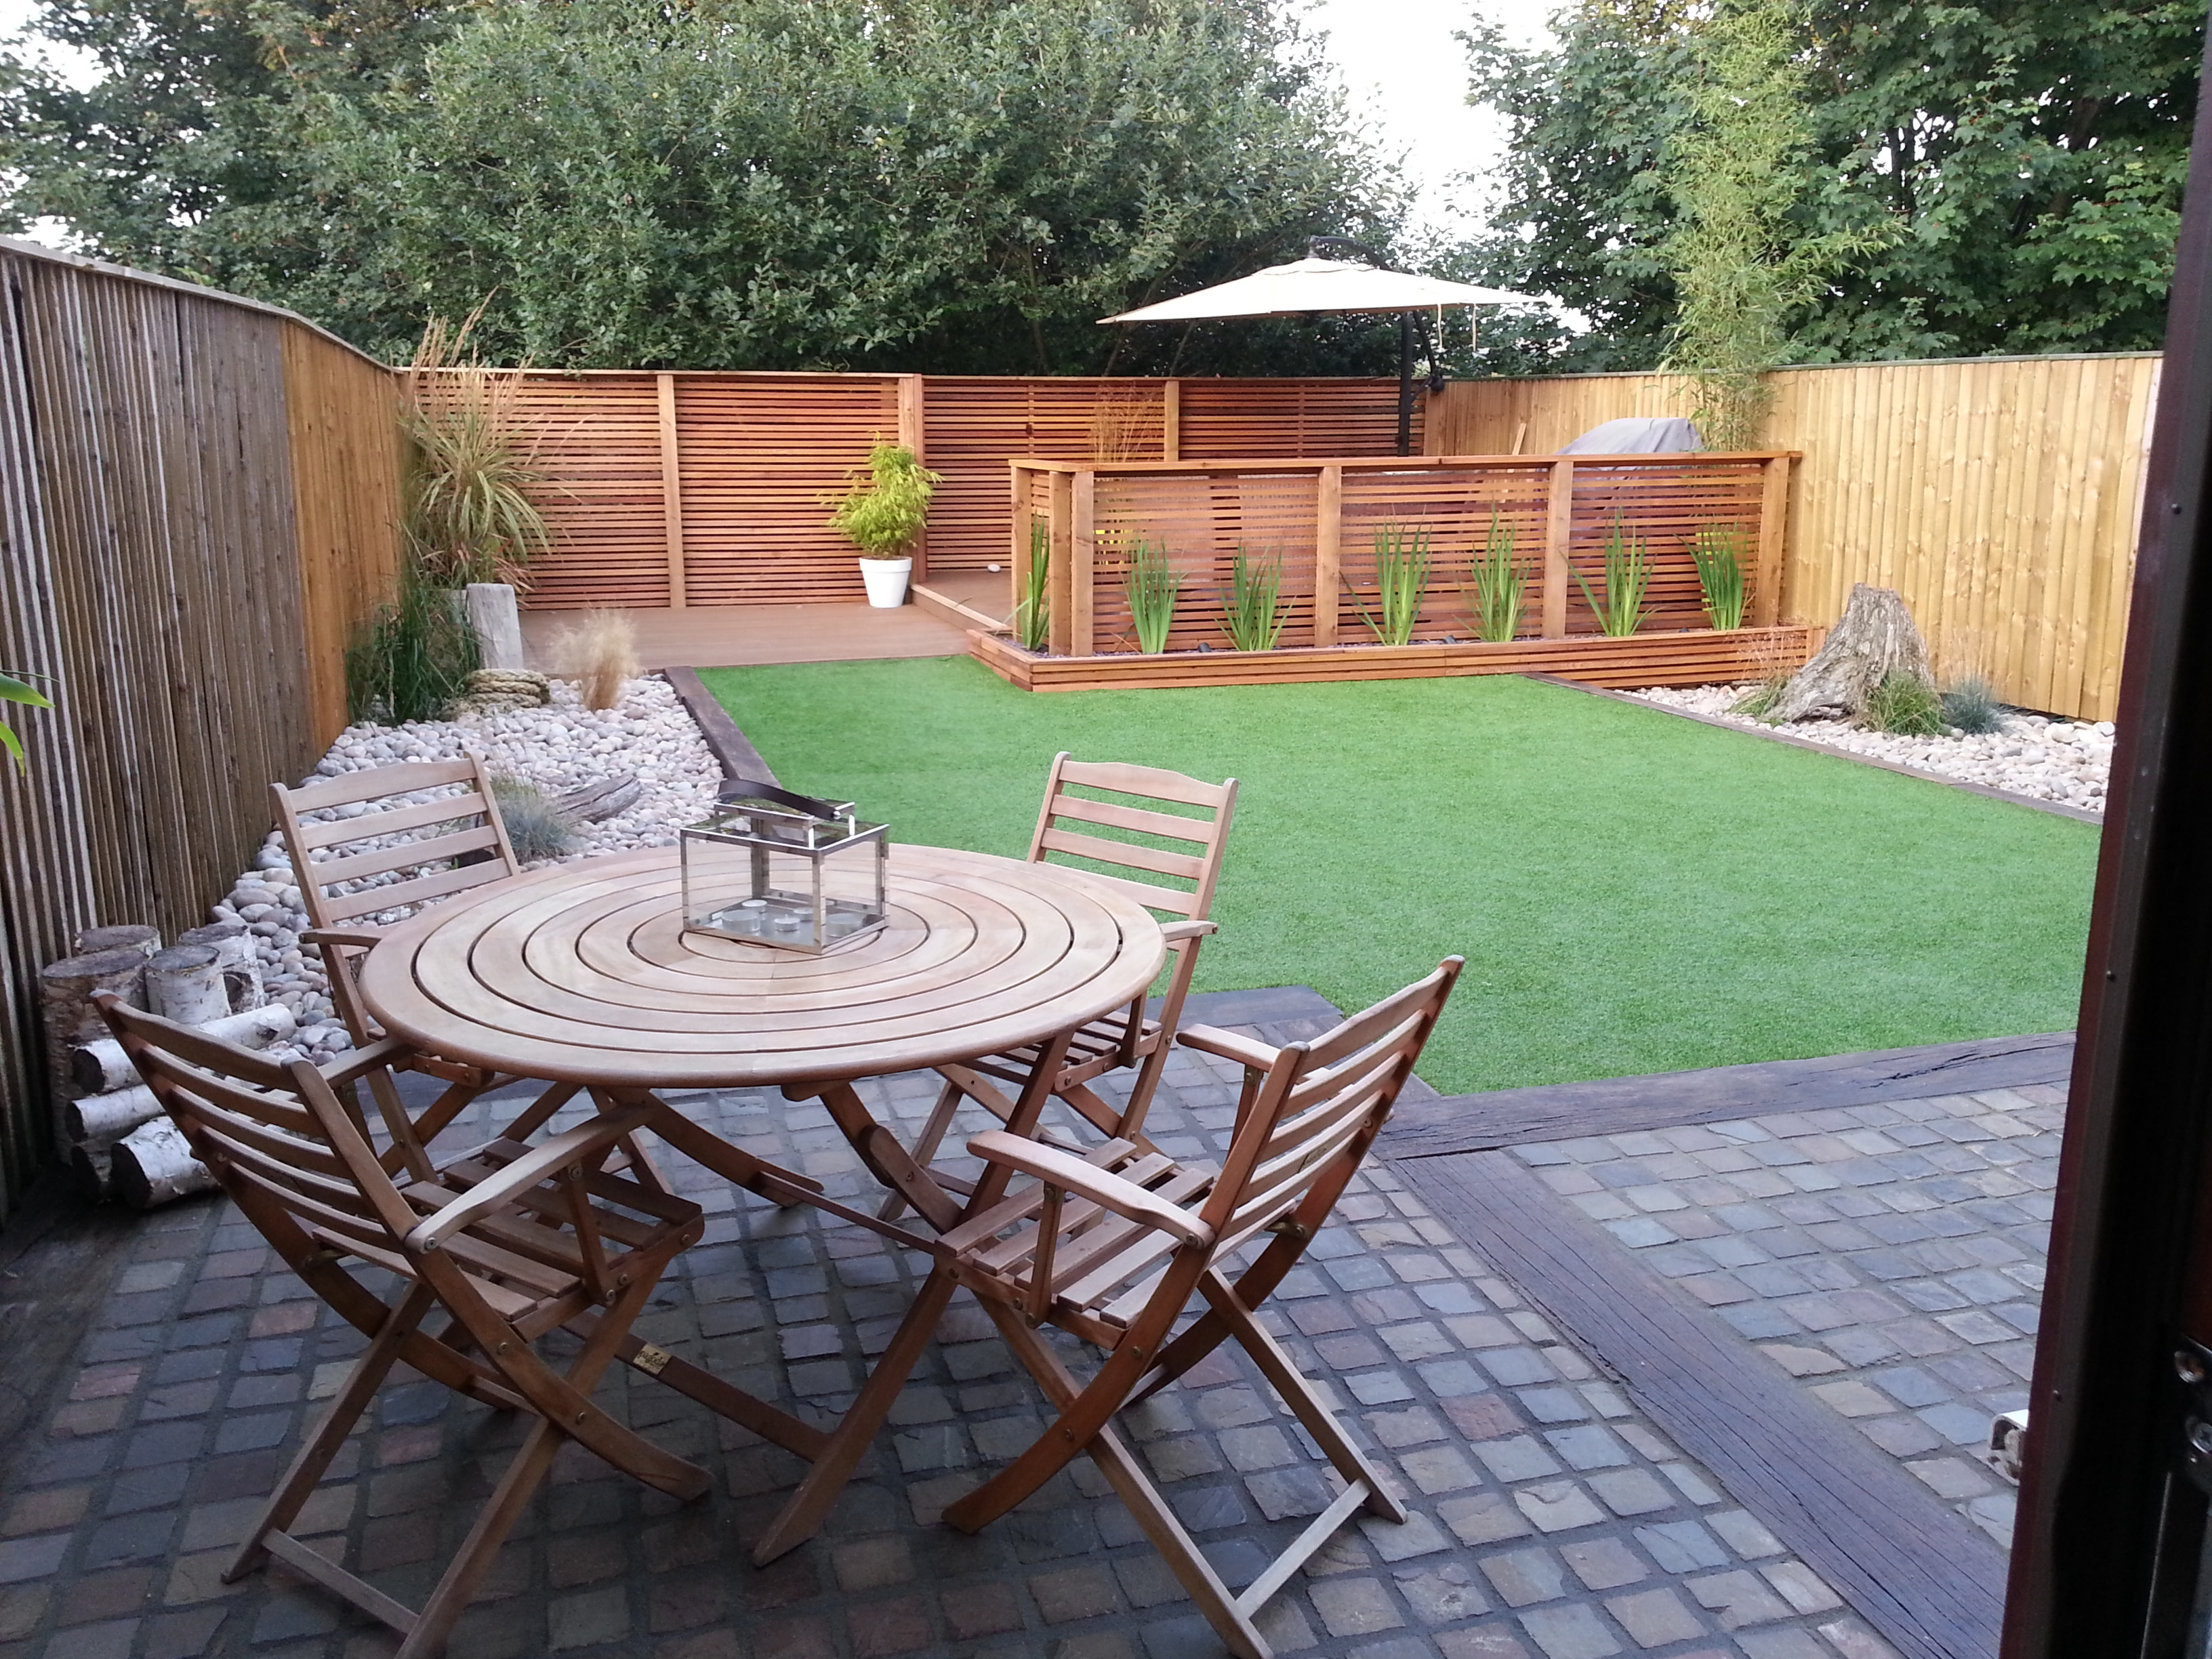 Best ideas about Garden Landscape Ideas . Save or Pin Landscape Gardening Now.